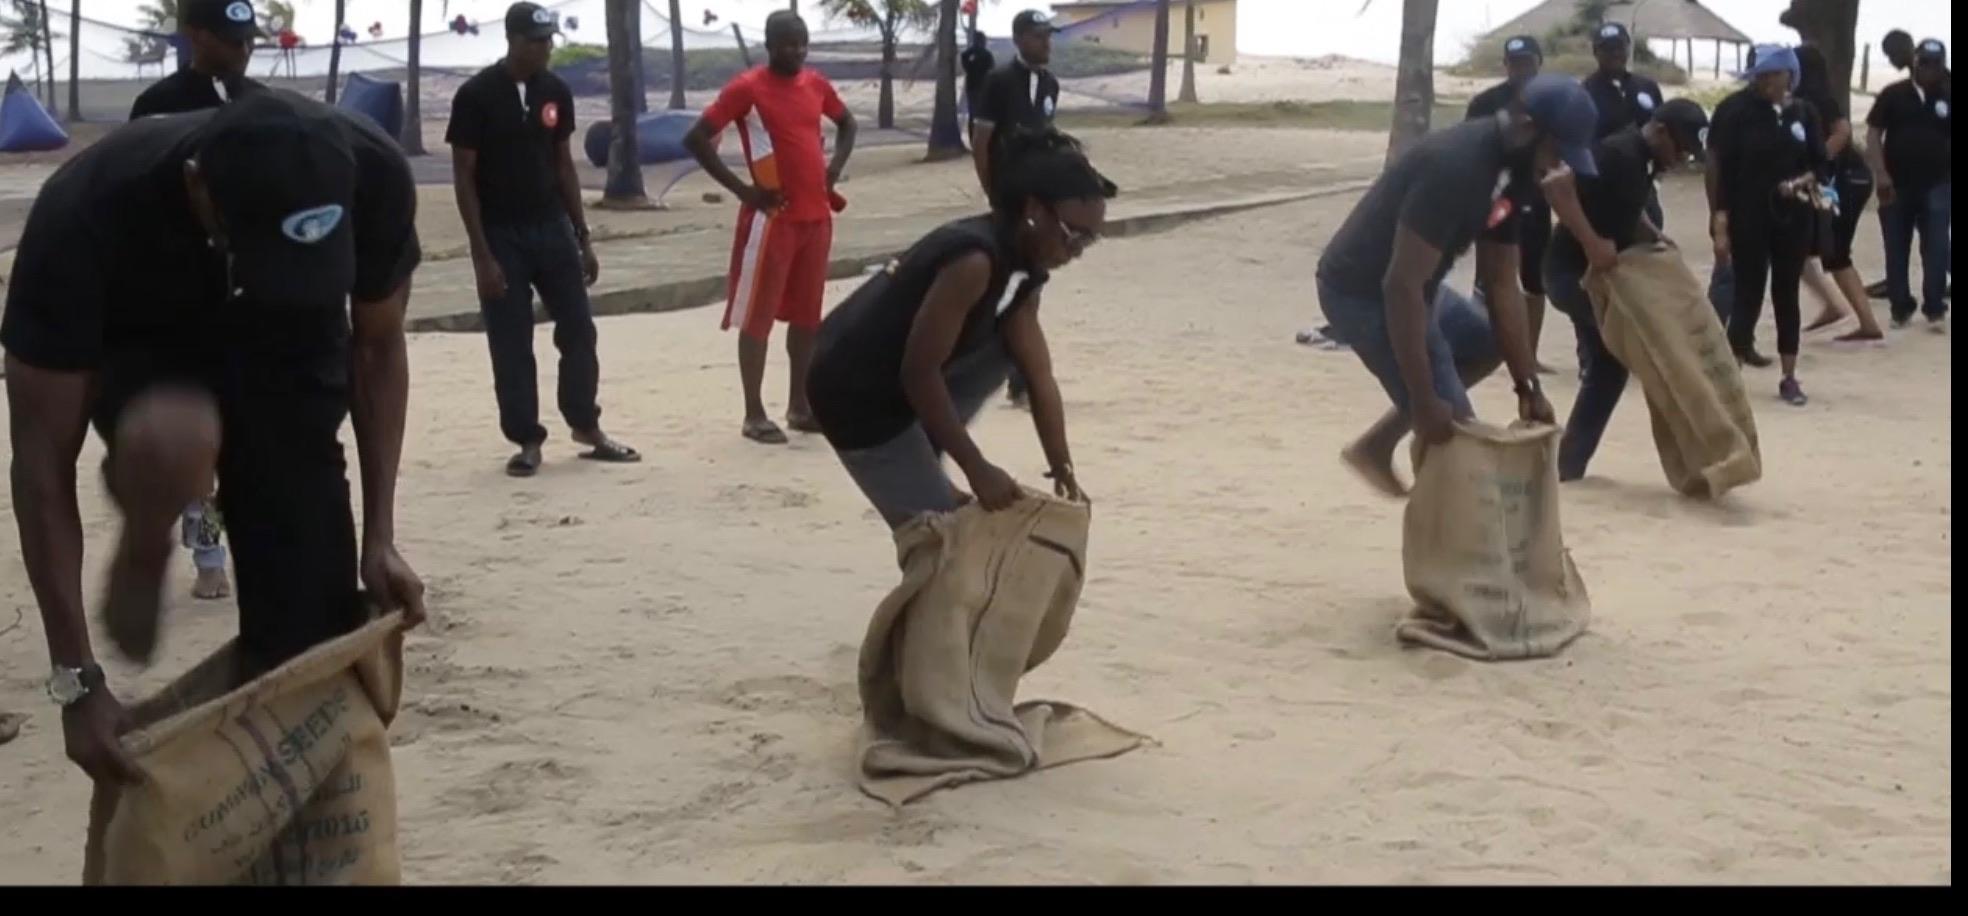 http://nigeriapaintball.com/admin/uploads/photos/gallery-21533128181.jpeg